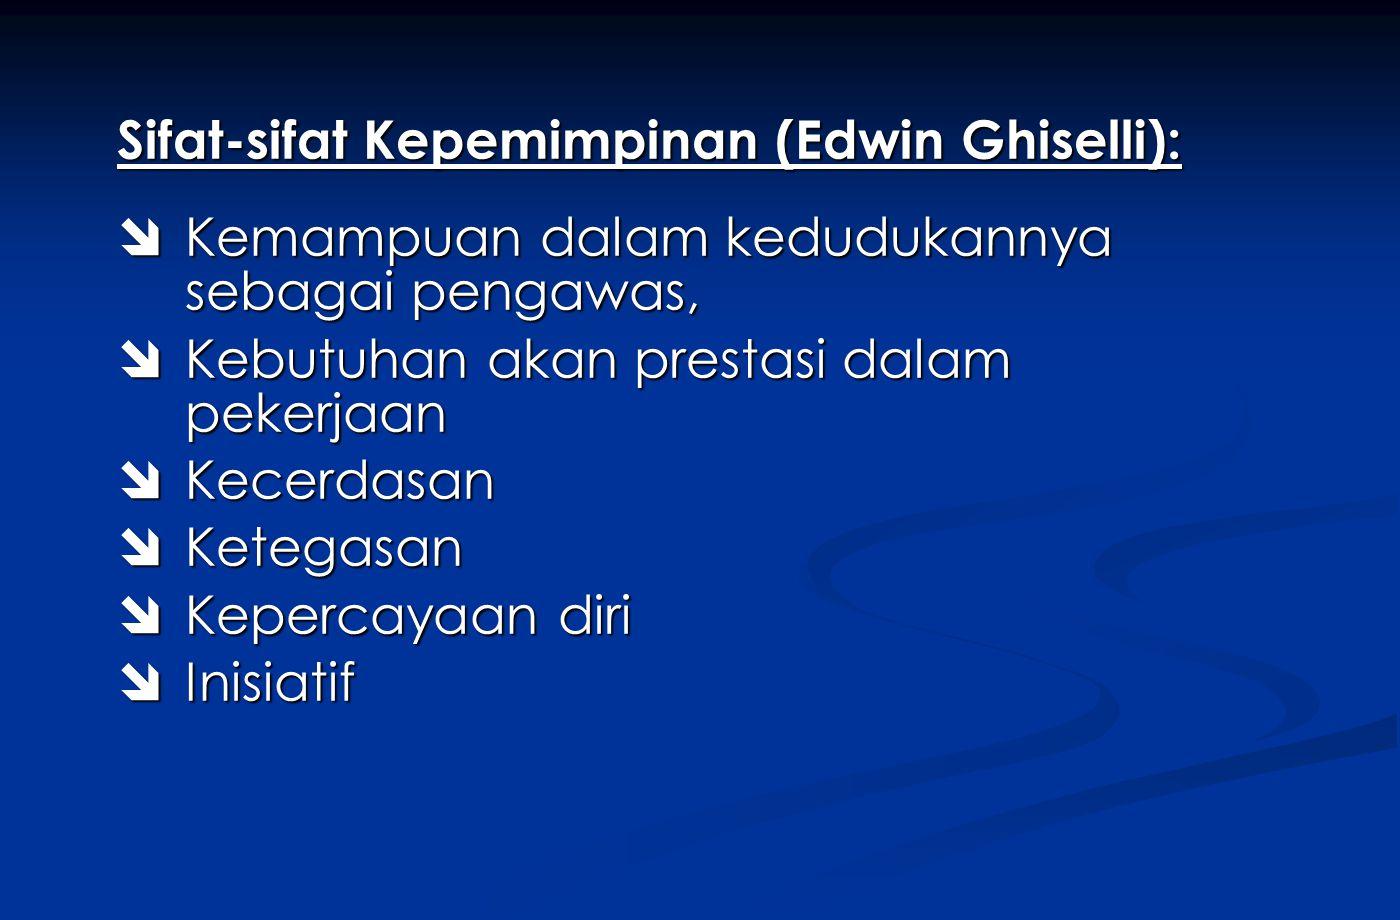 Sifat-sifat Kepemimpinan (Edwin Ghiselli):